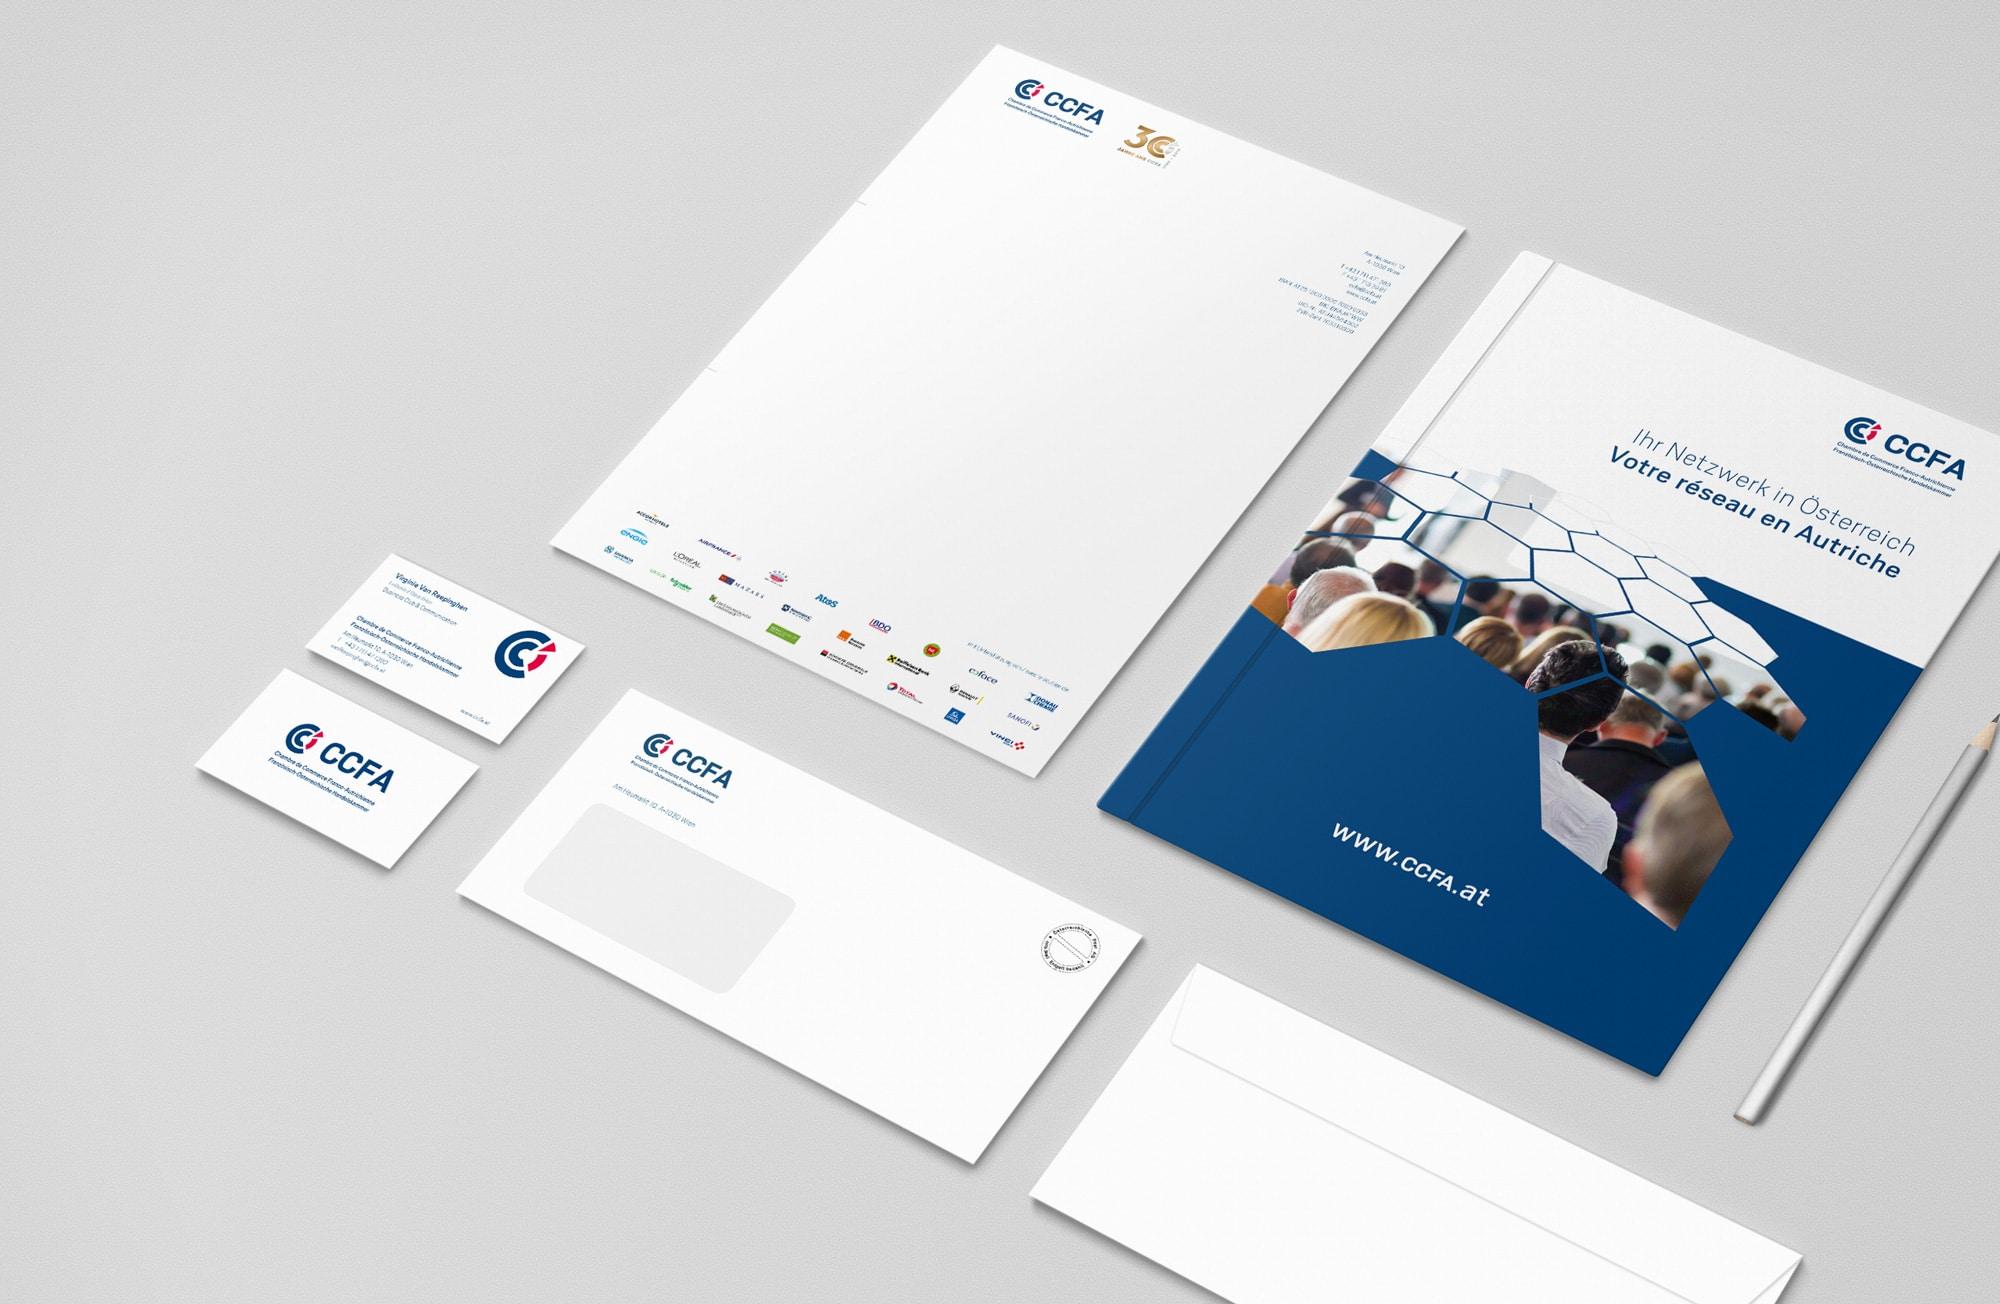 Coporate-Design-by-PiKSEL-CCFA